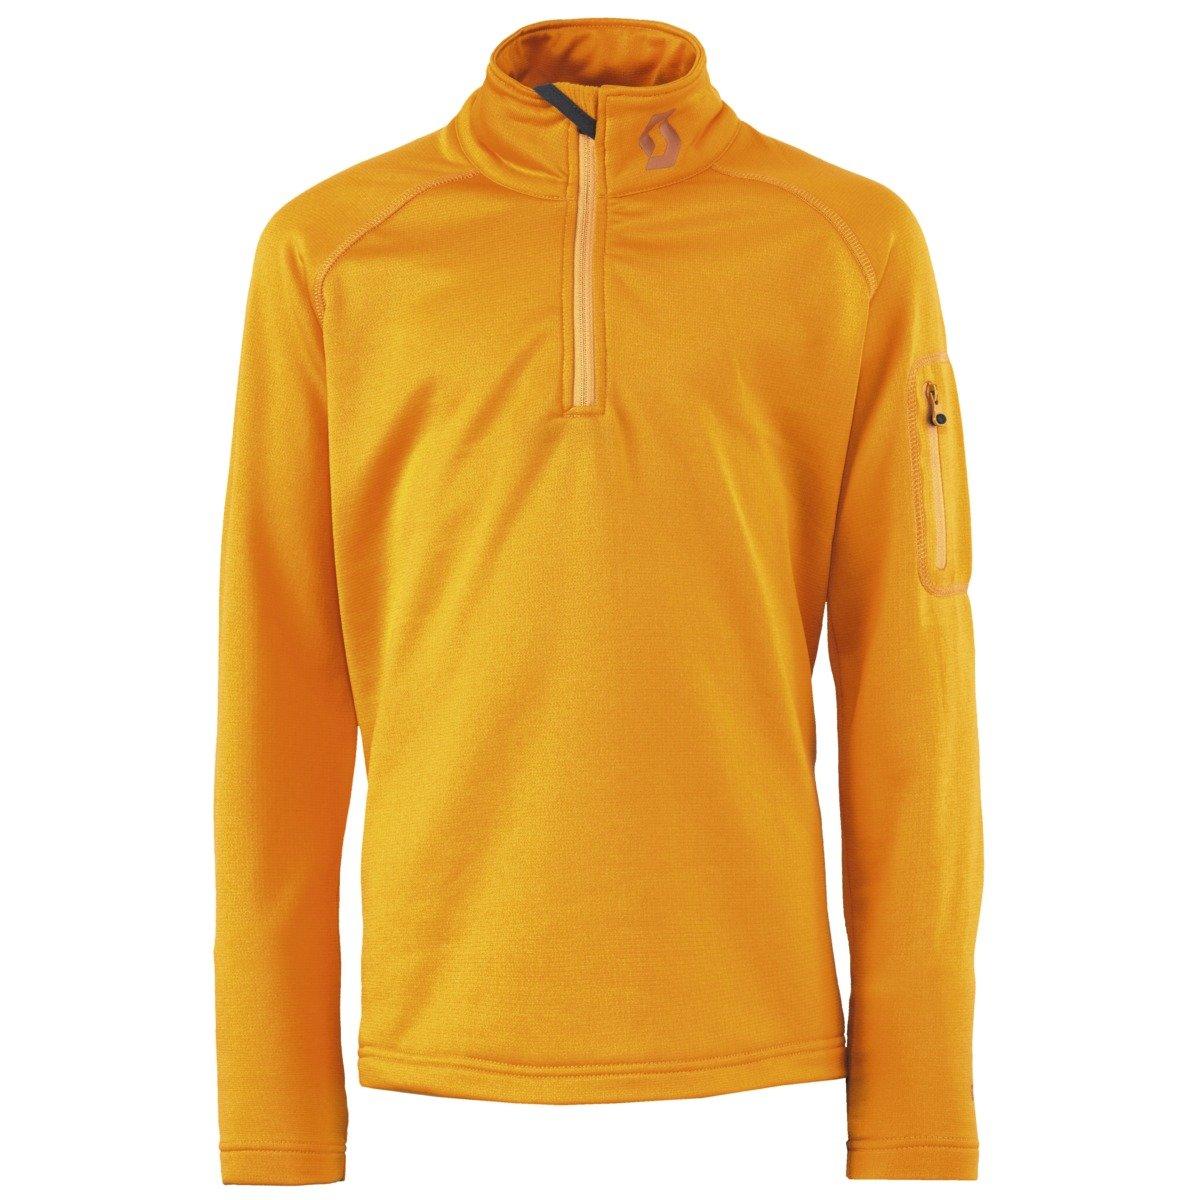 Scott Kinder Funktionspullover 1/2 Zip JR Pullover Two2 online bestellen